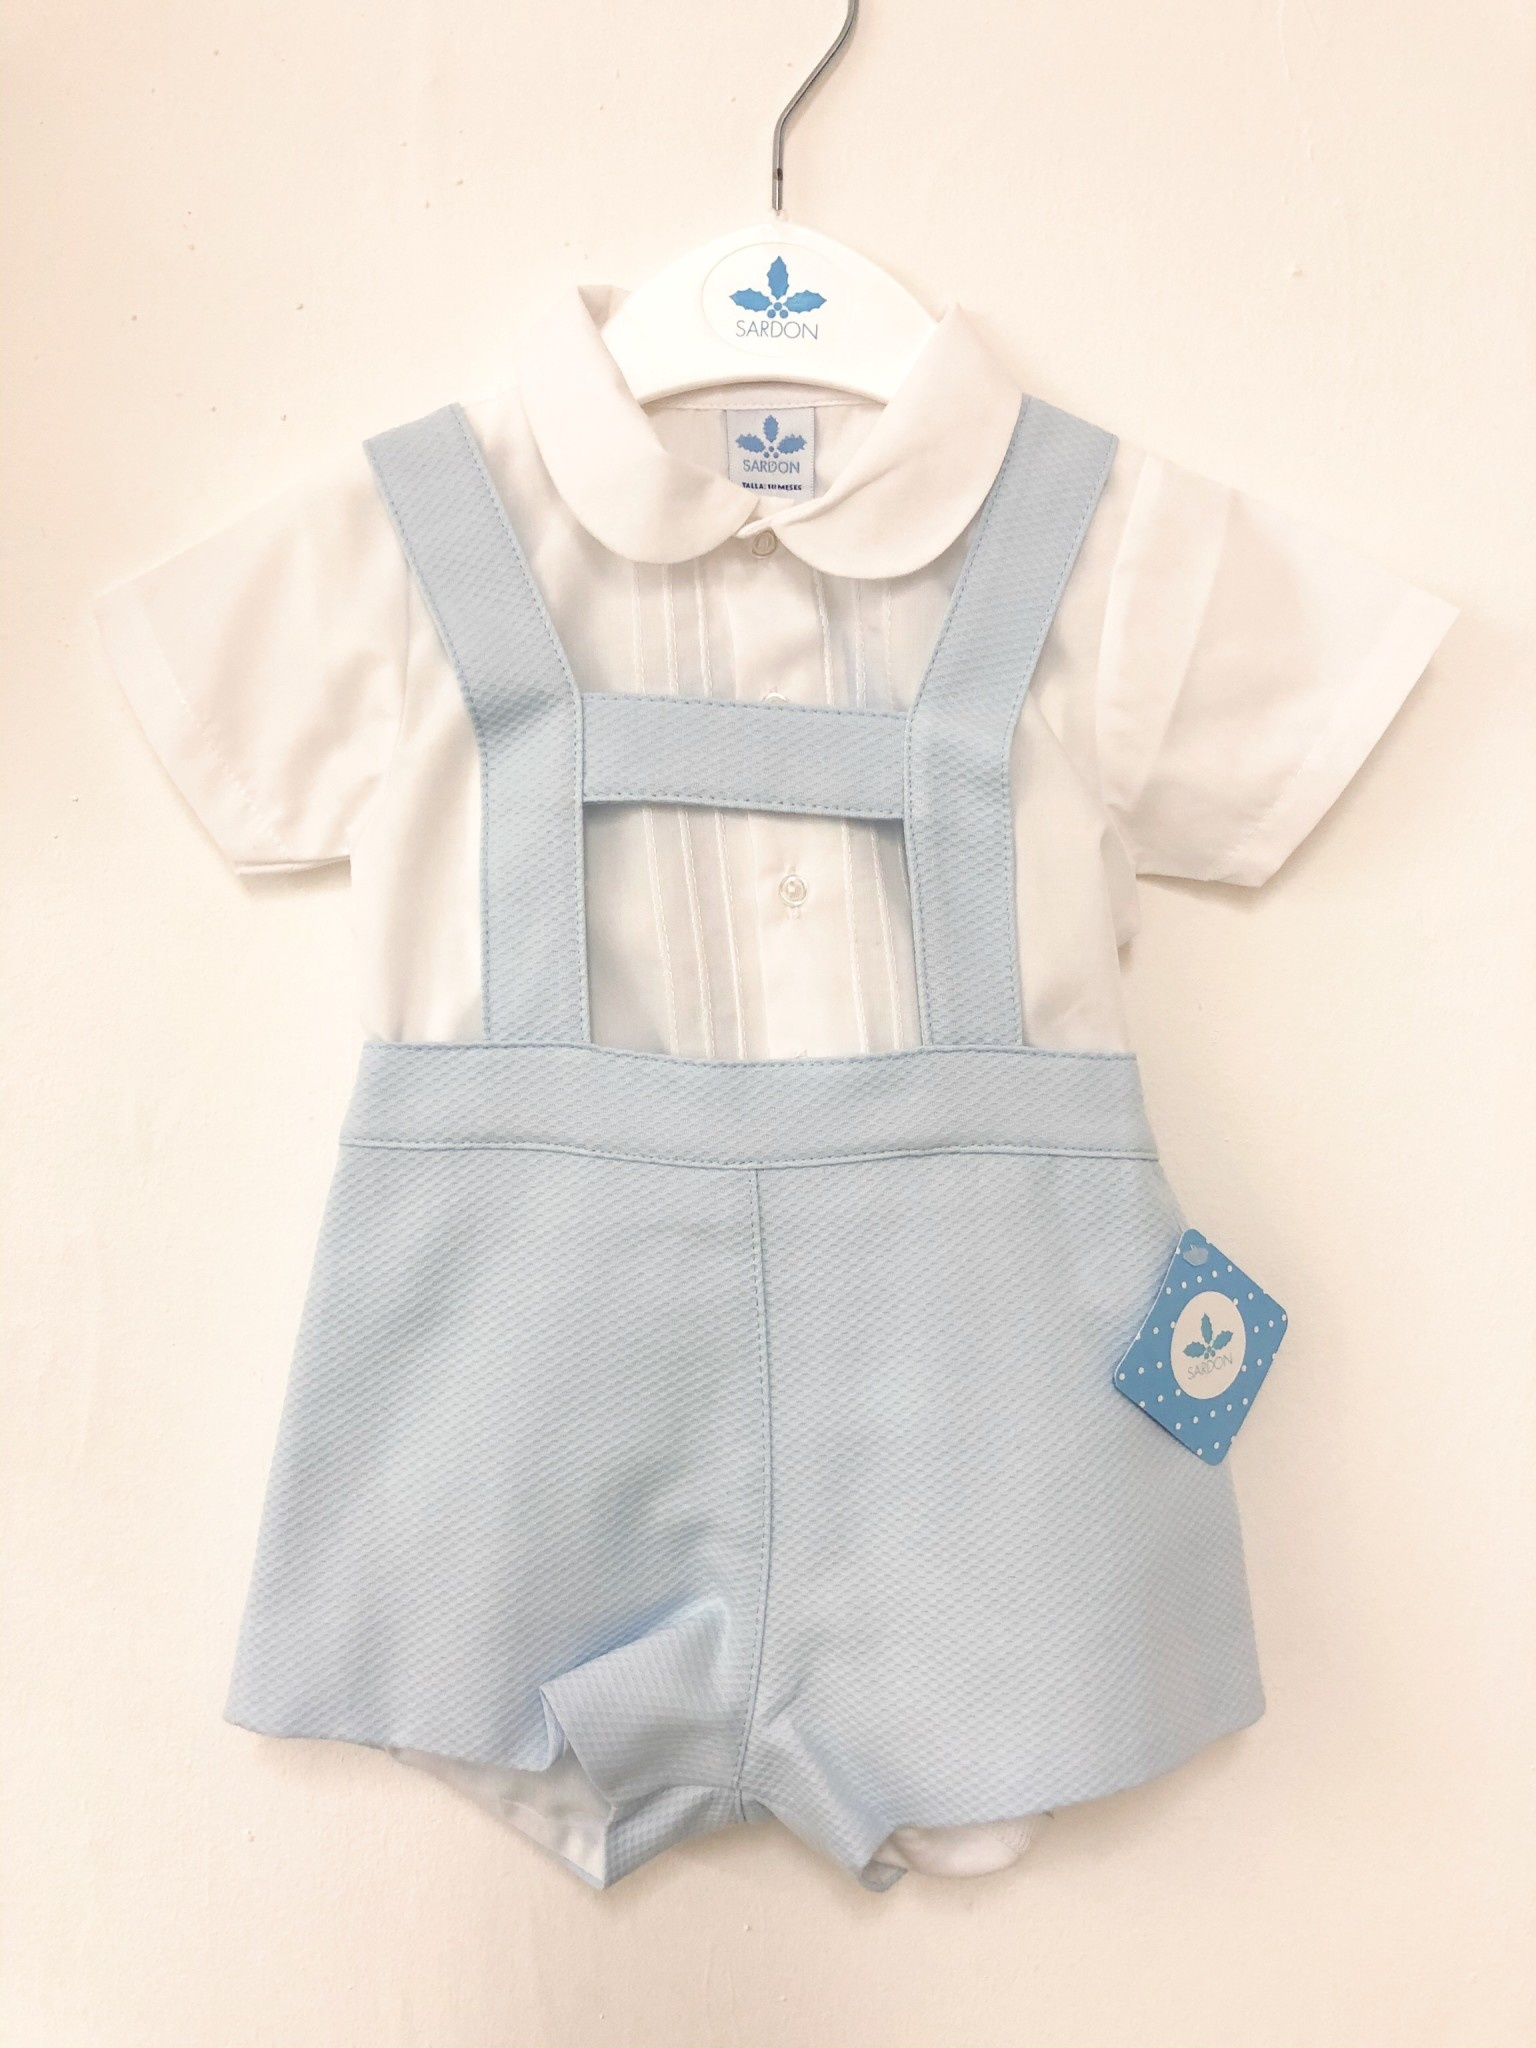 Sardon Sardon 20AB-03 Pale Blue Dungaree/ Shirt Set